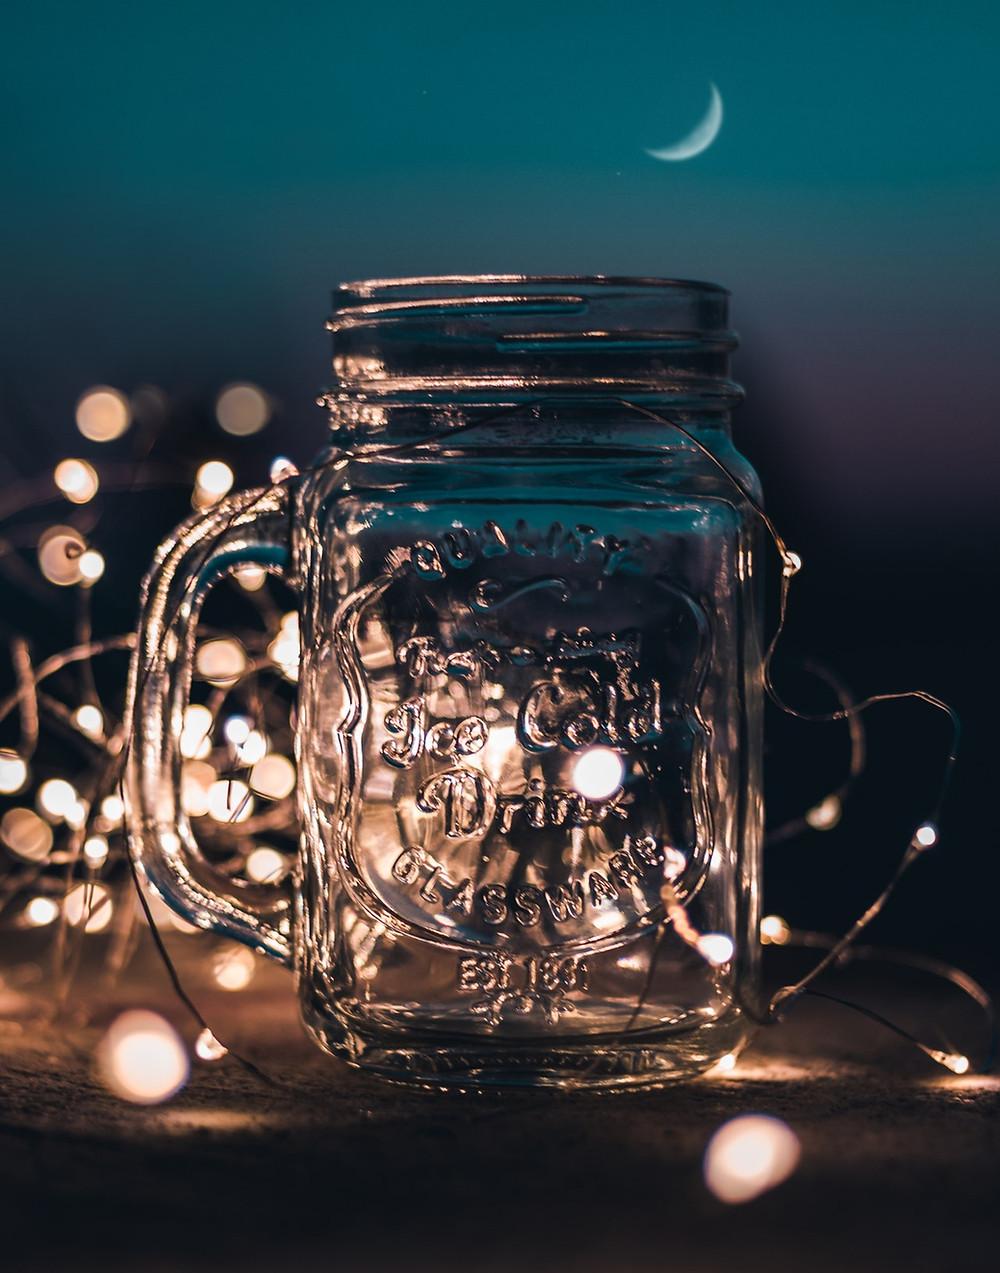 lights in glass jar